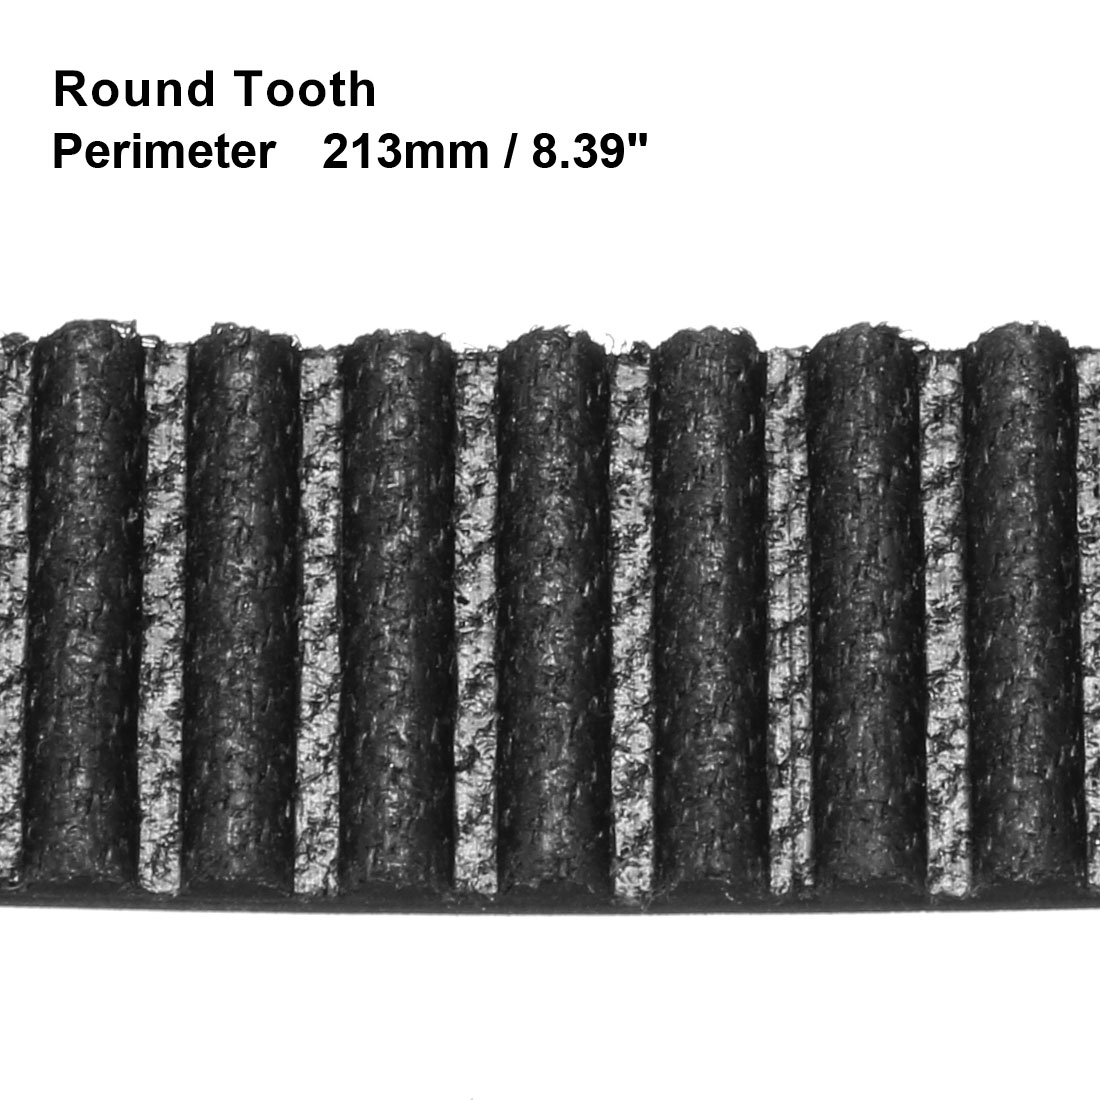 Unique Bargains HTD3M 71 Teeth Engine Timing Belt Rubber Geared-Belt 213mm Girth 10mm Width - image 1 of 2